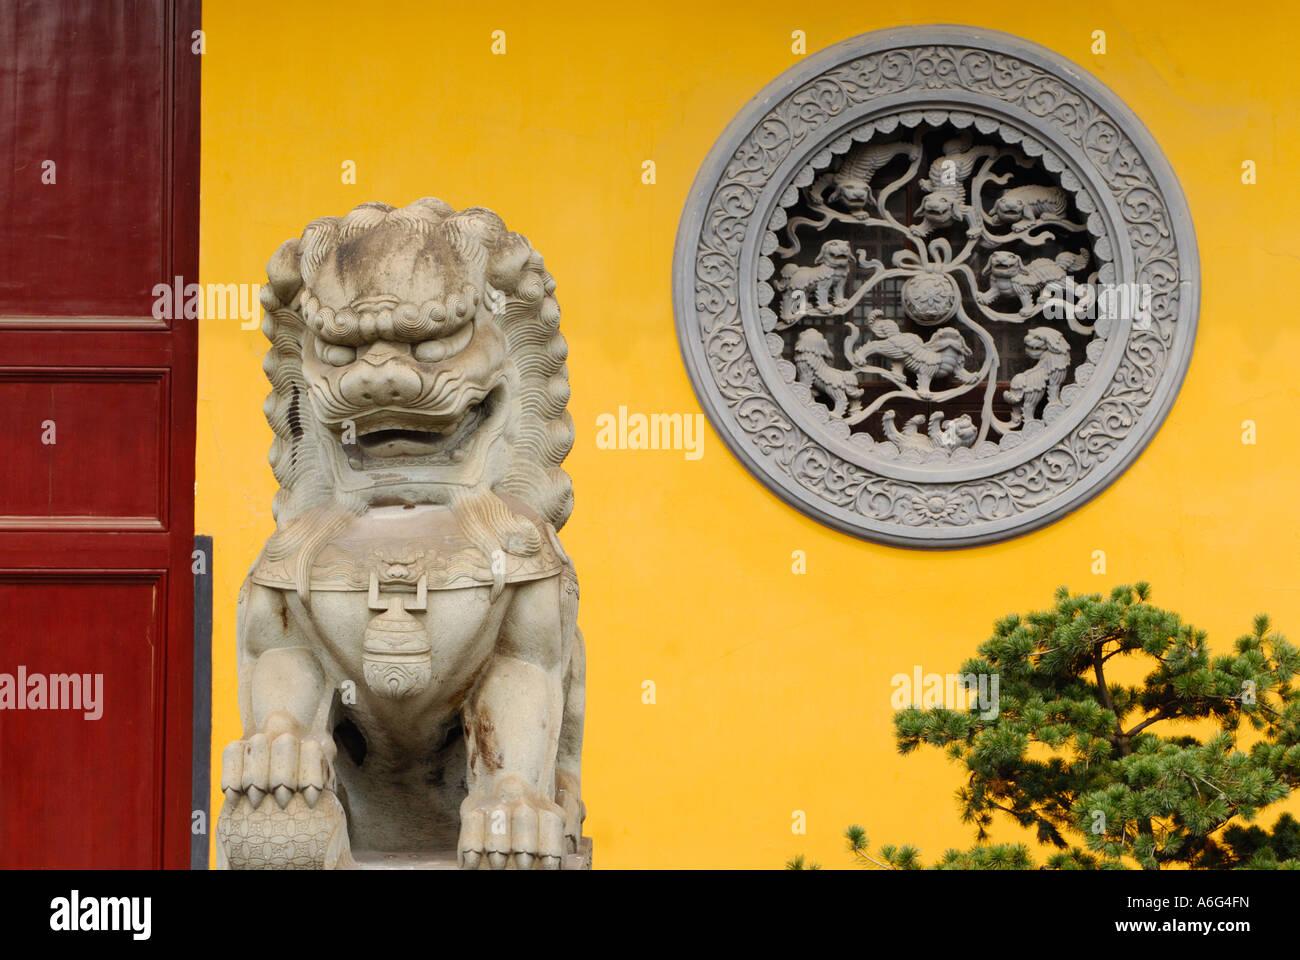 China Shanghai Longhua Temple - Stock Image